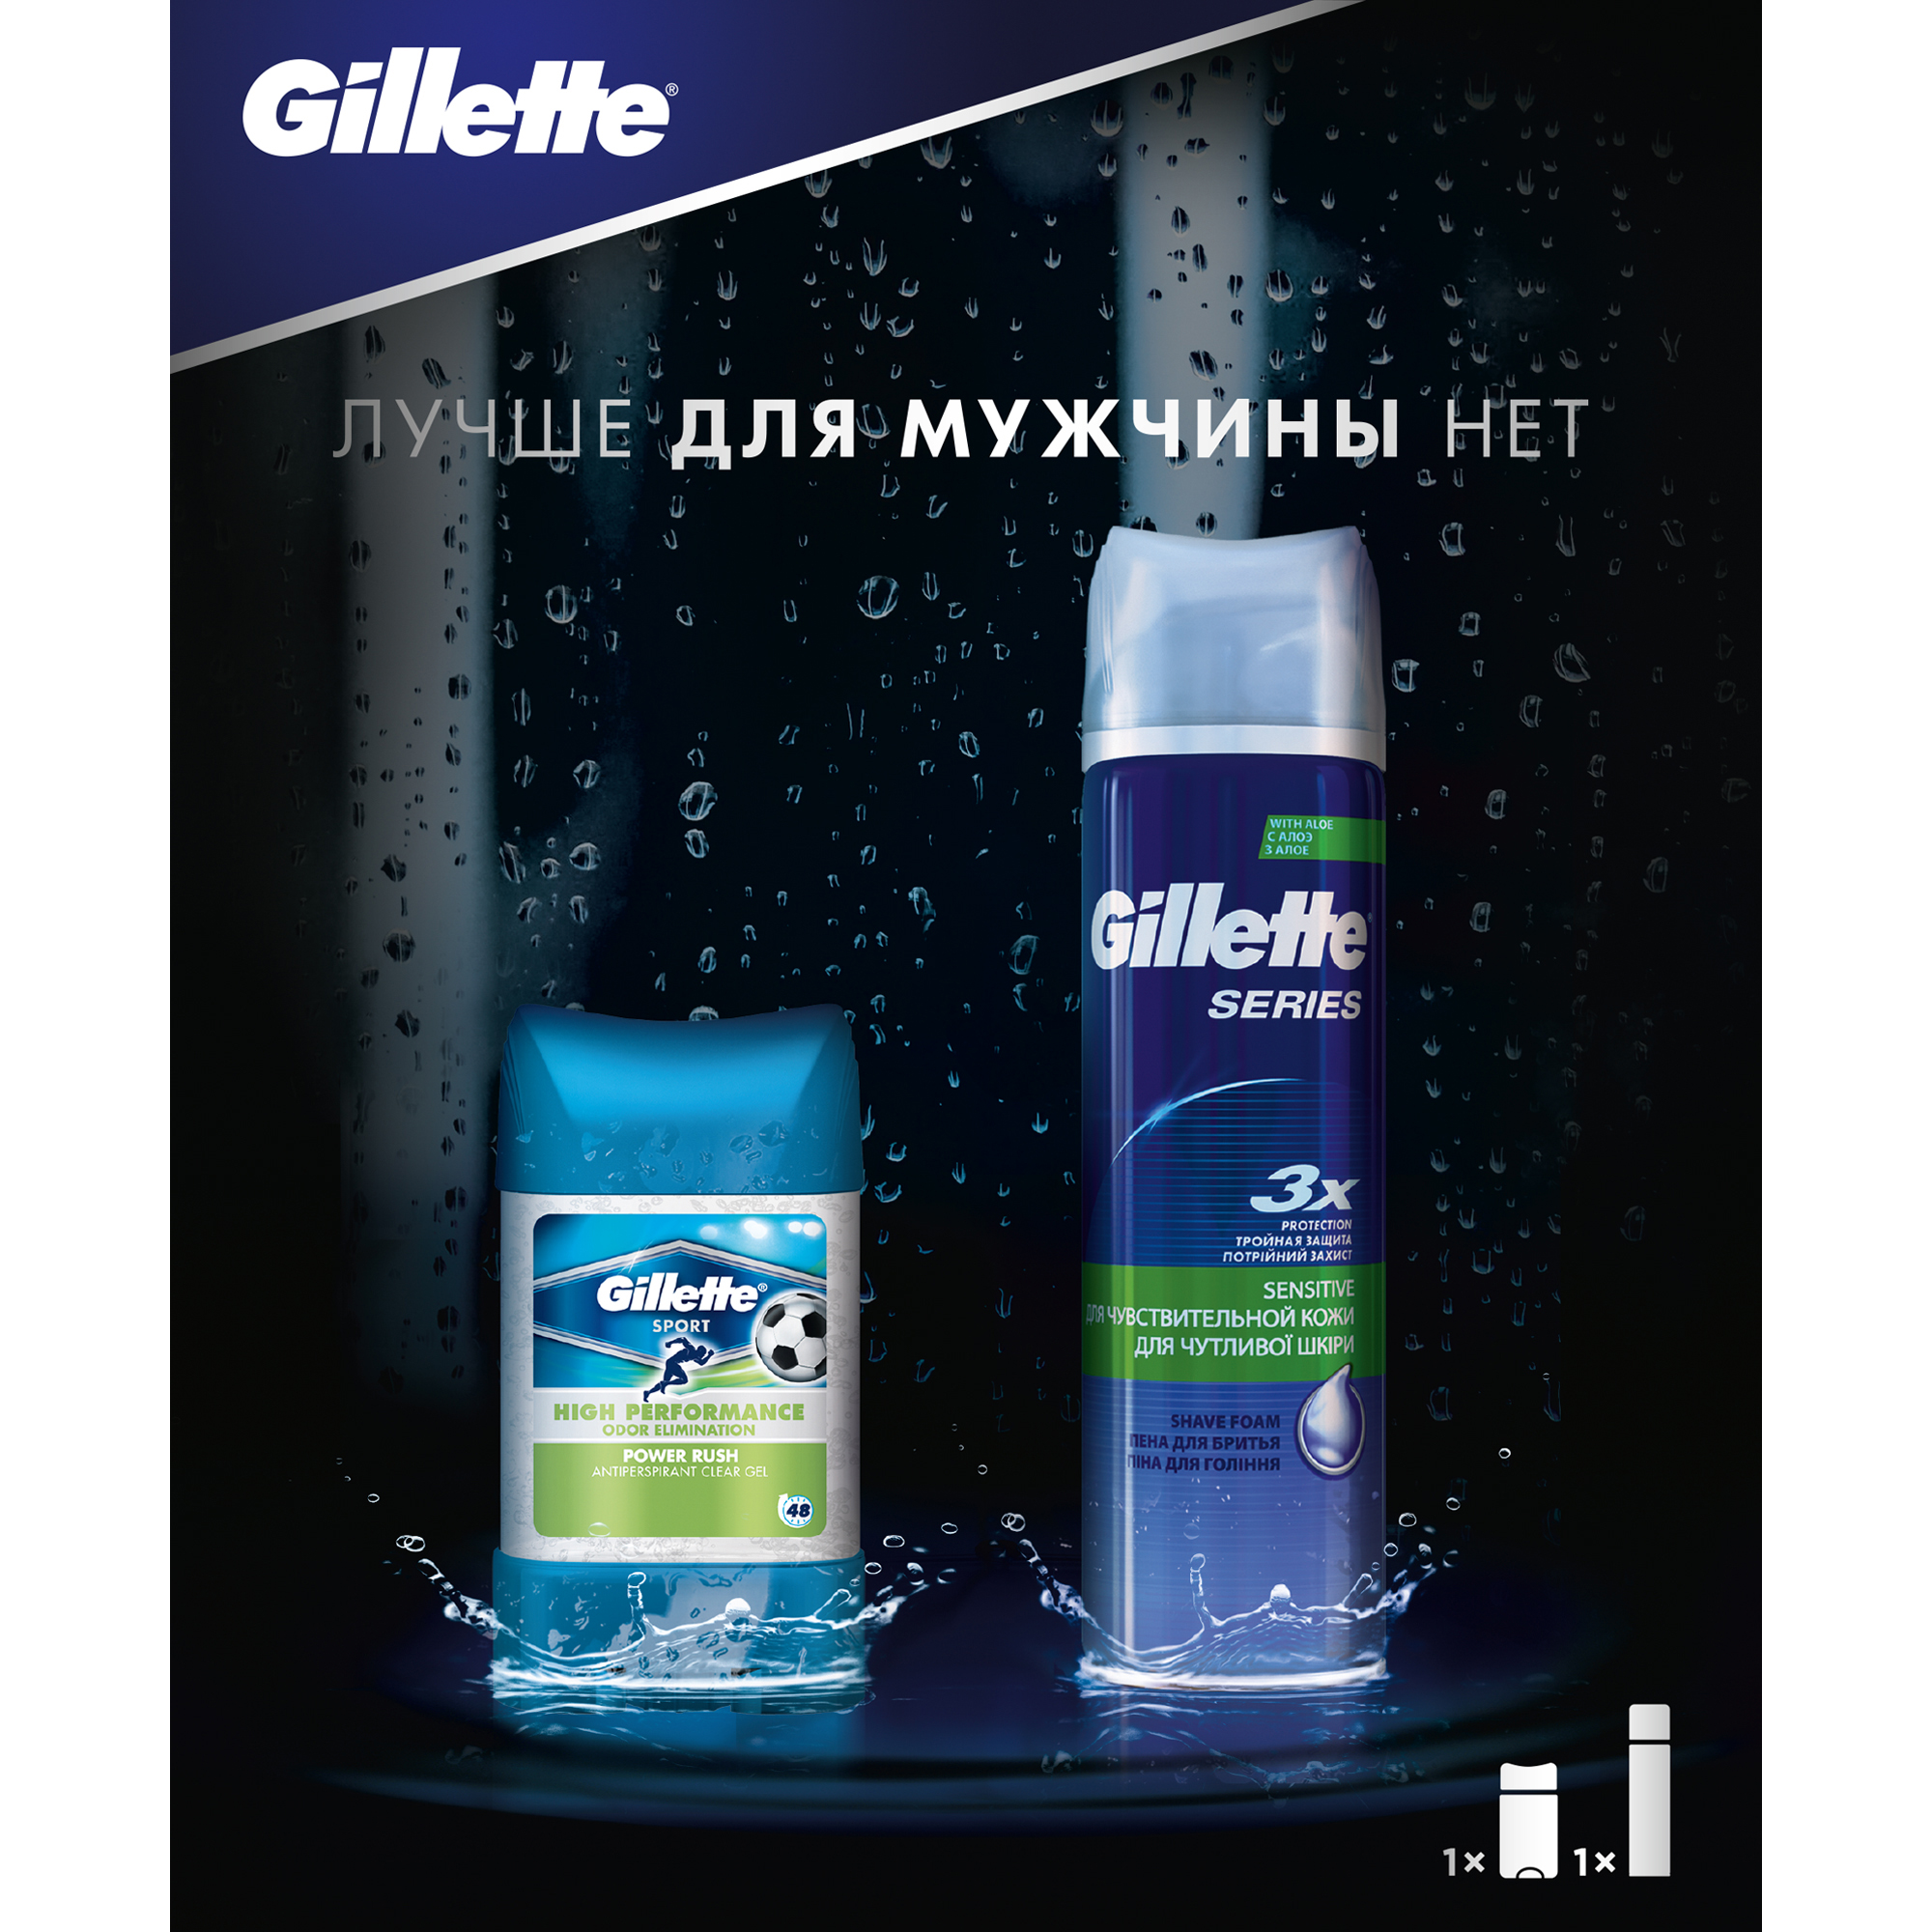 Gillette Gift Set (Gillette Series Shaving Foam 250 ml + Gillette Power Beads Power Rush 75 ml Antiperspirant Deodorant) подарочный набор gillette пена для бритья series 250 мл гелевый антиперспирант дезодорант power beads power rush 75 мл